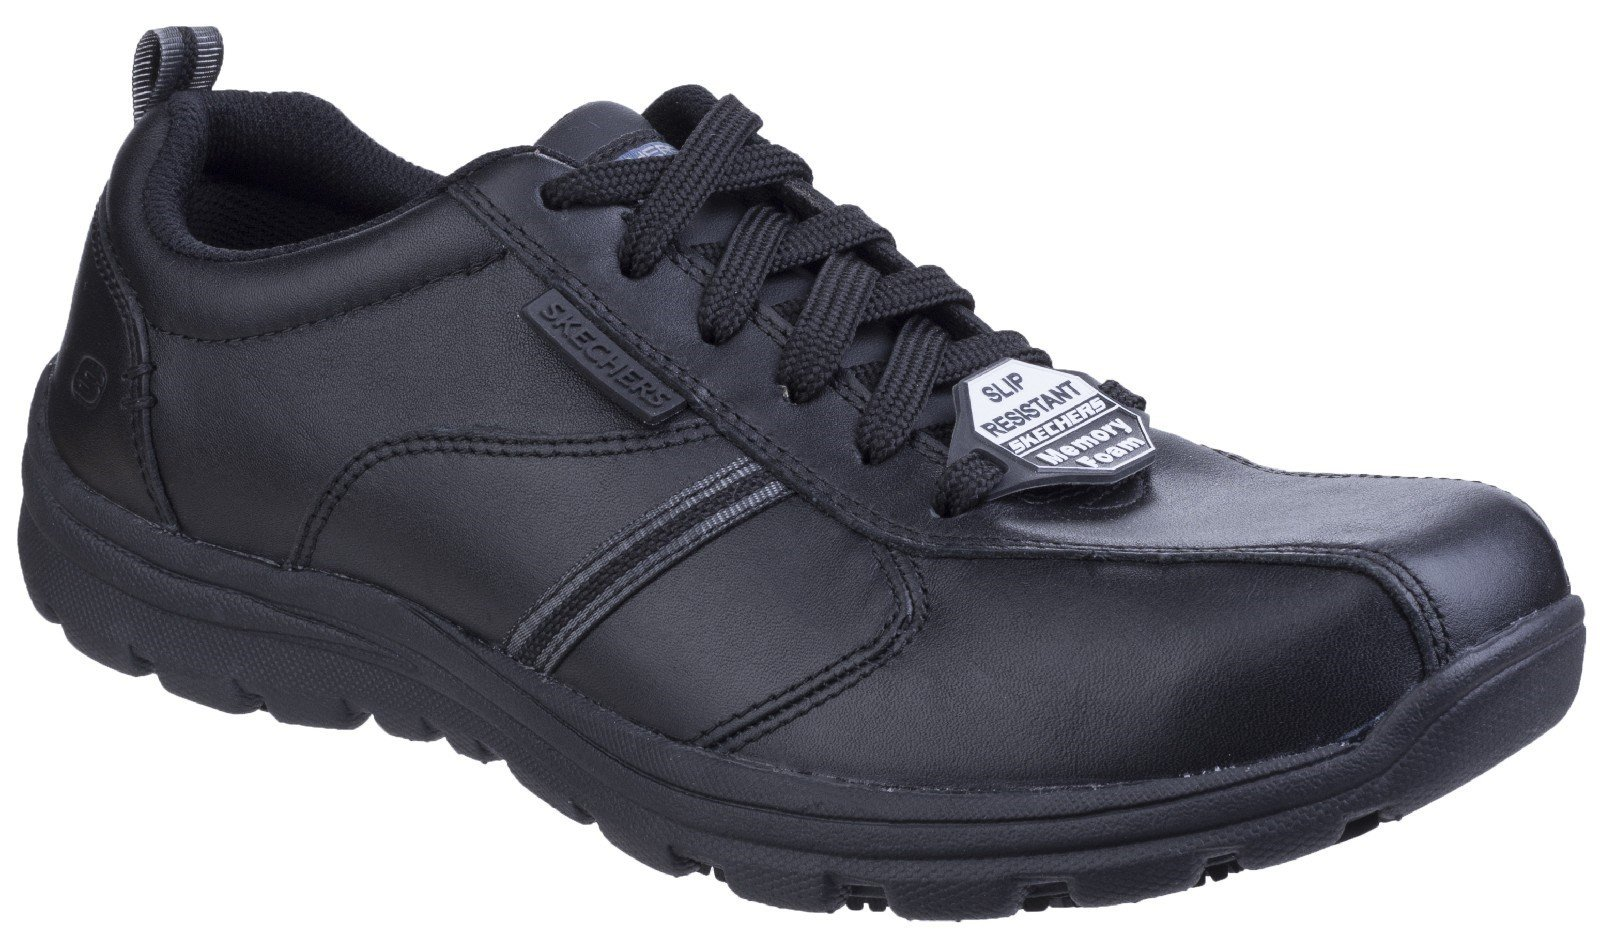 Skechers Unisex Hobbes Frat Lace up Shoe Black 25220 - Black 10